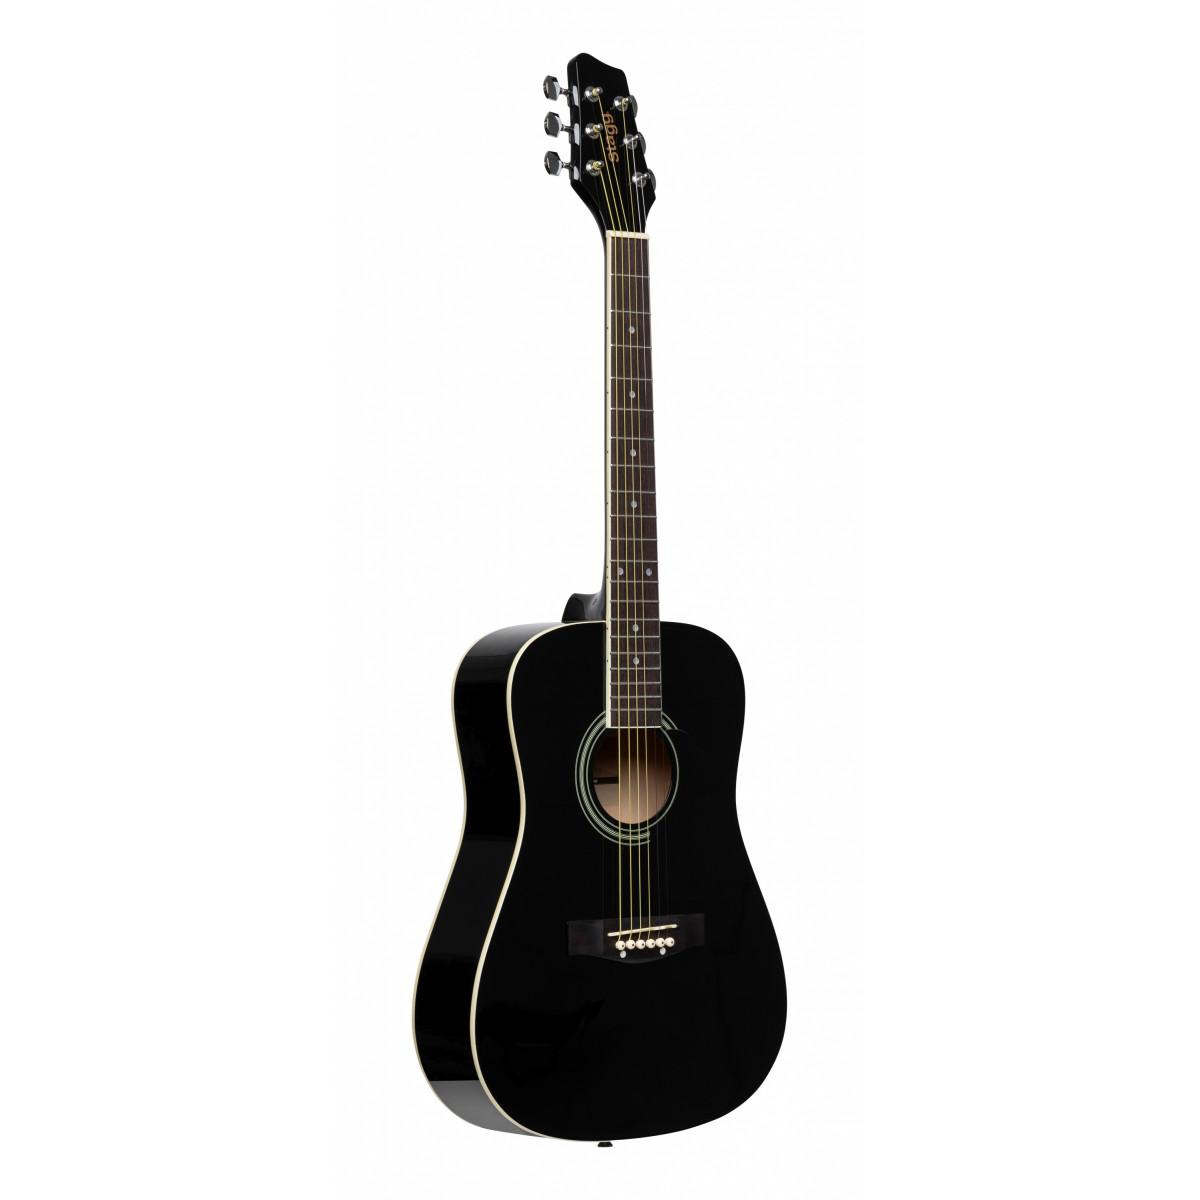 Guitare enfant 3/4 folk - noir